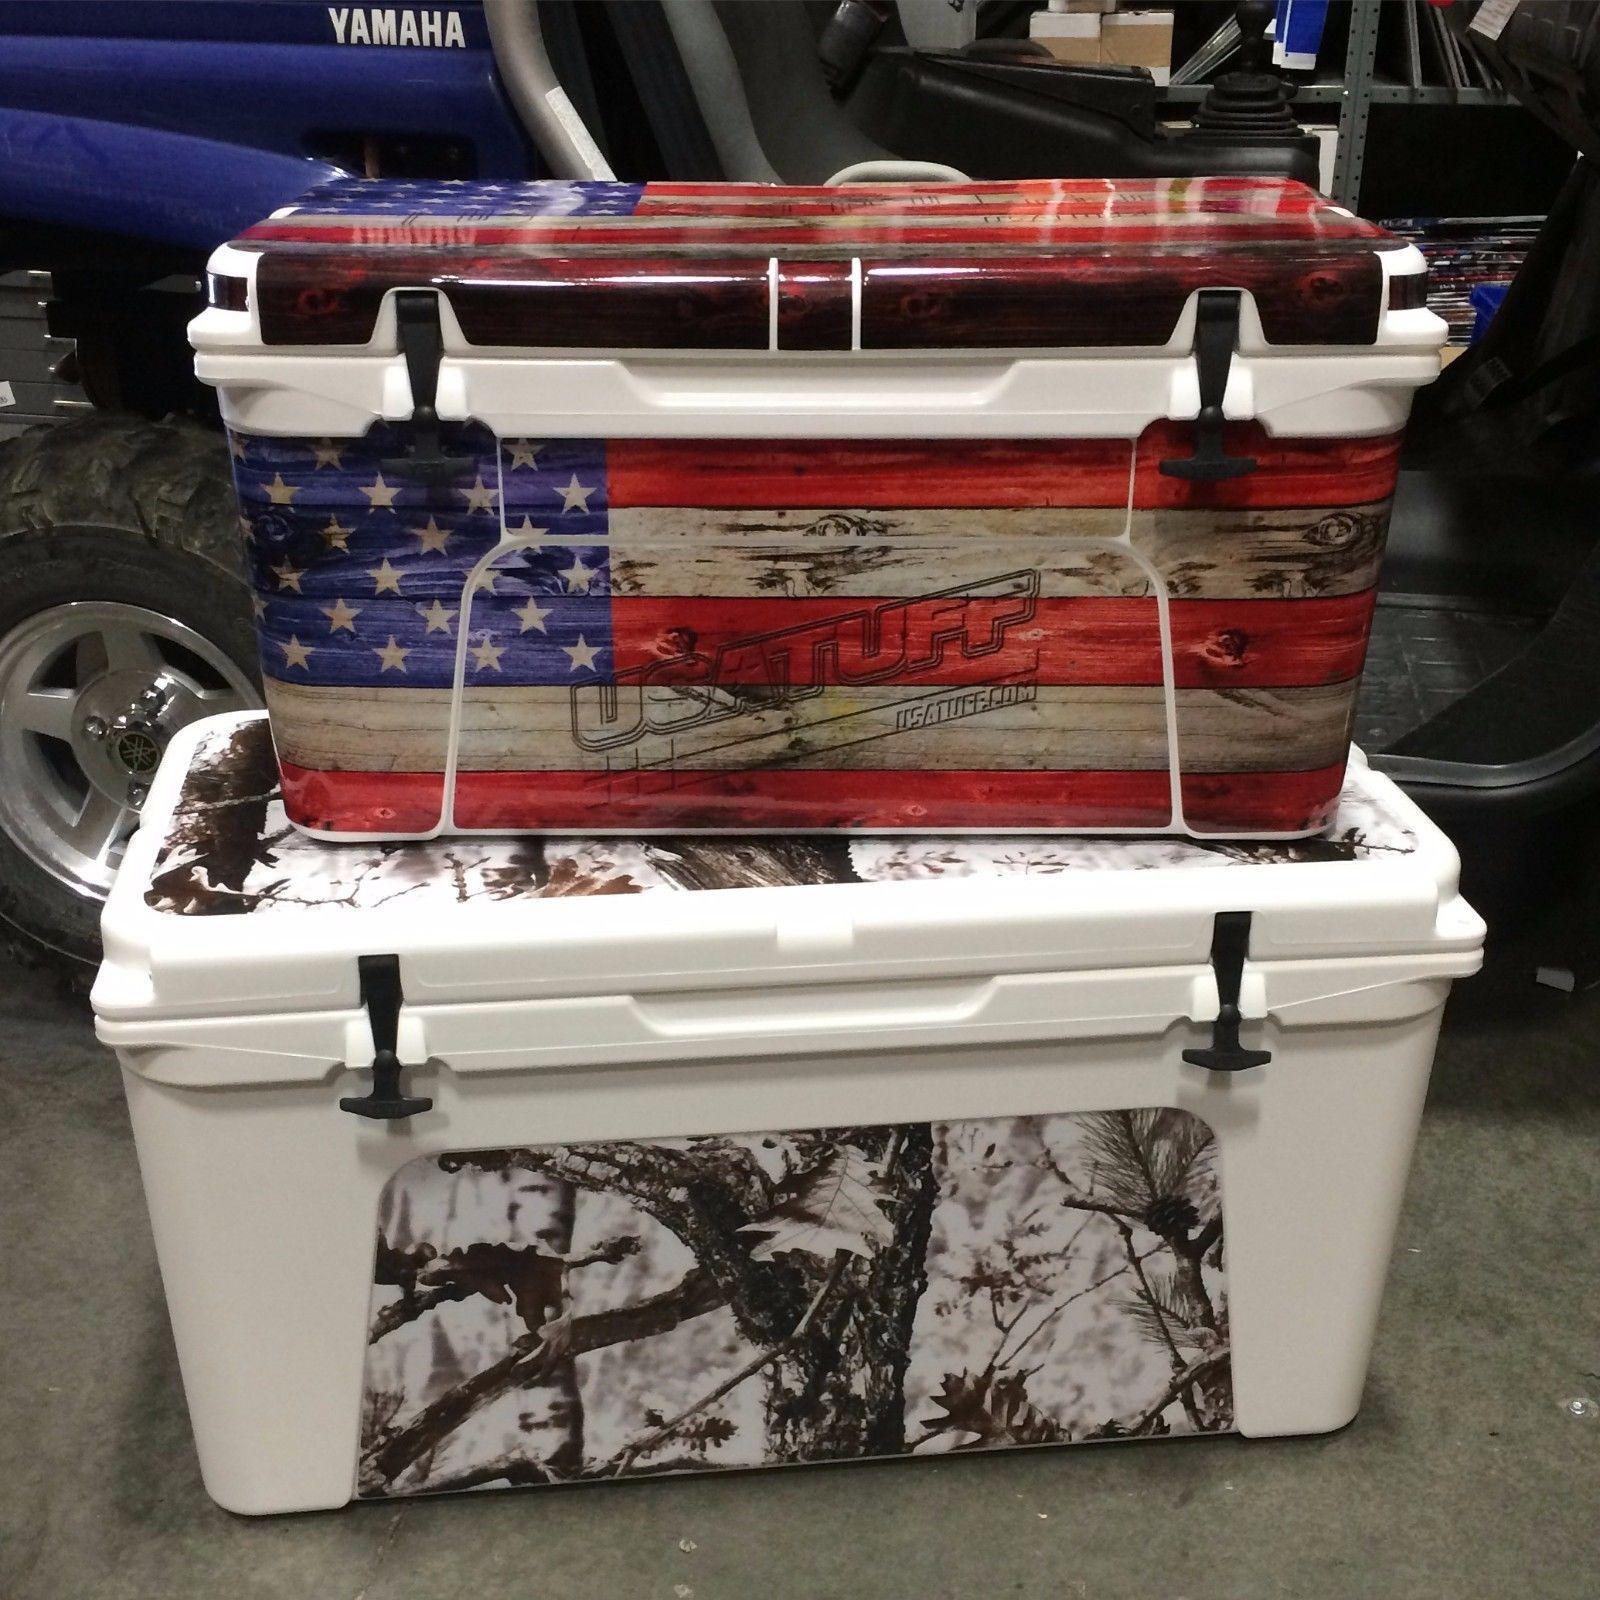 USATuff Sportsman Decal Wrap Full Kit fits IGLOO Sportsman USATuff 20qt Cooler Pirate Flag WD a819ce